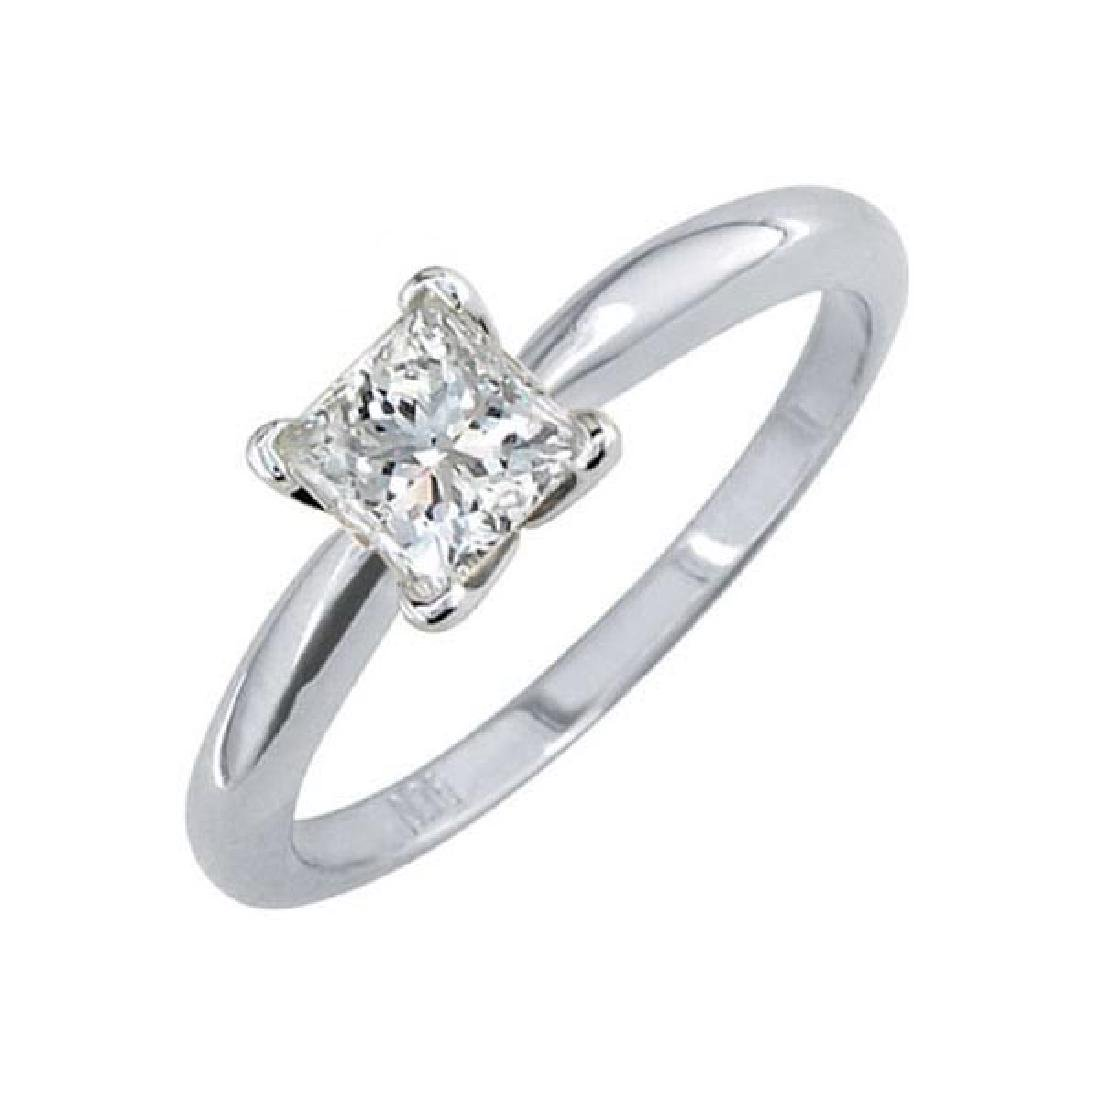 Certified 0.7 CTW Princess Diamond Solitaire 14k Ring E